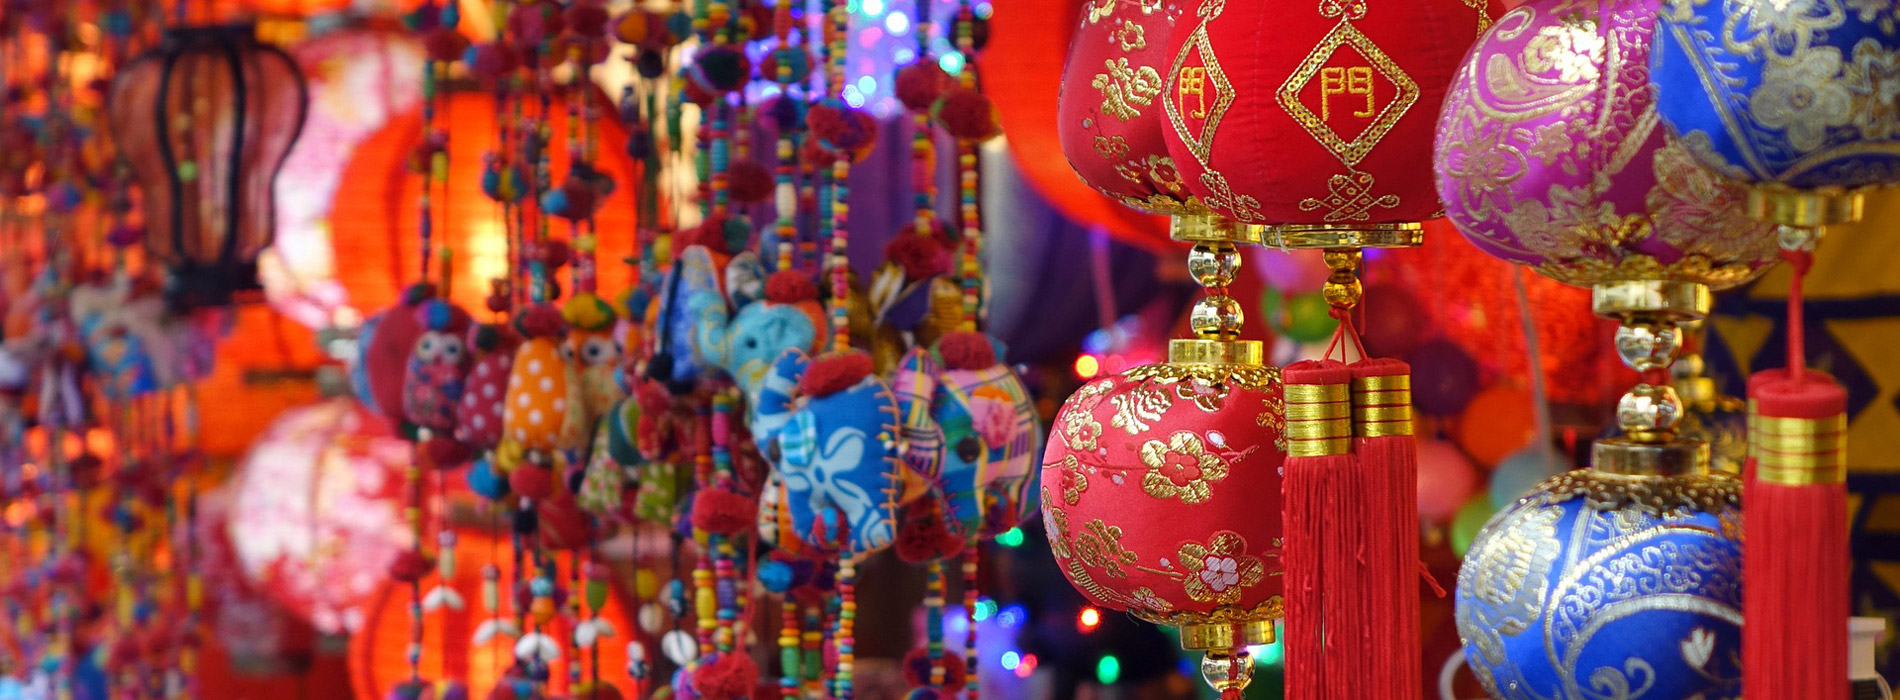 rondreis singapore chinatown header